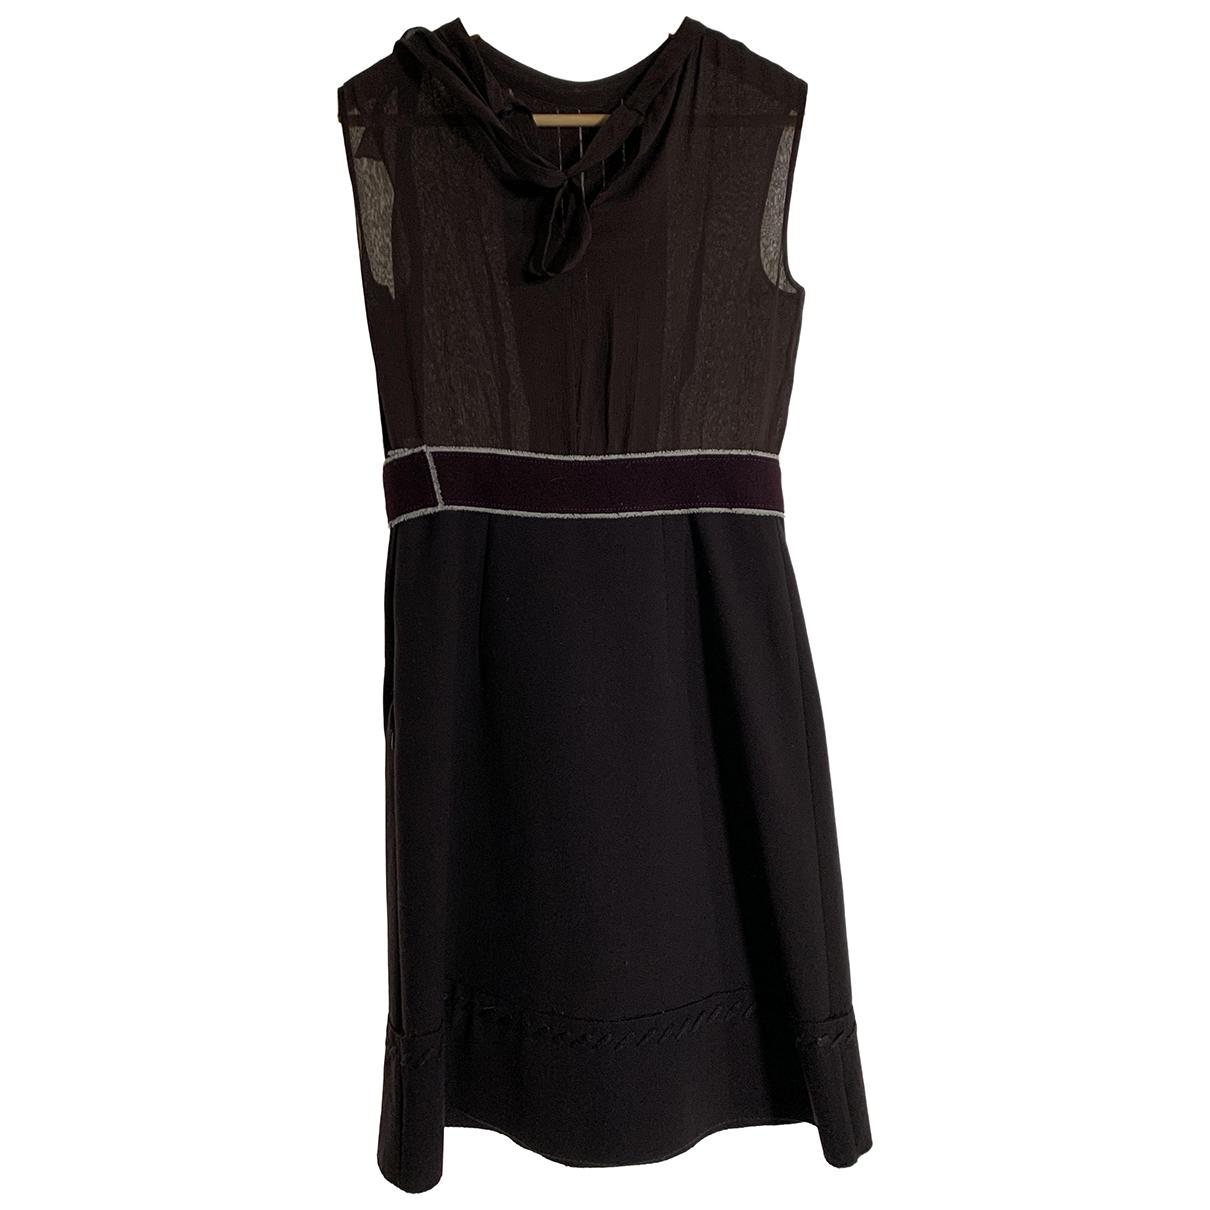 Prada \N Brown Wool dress for Women 40 IT